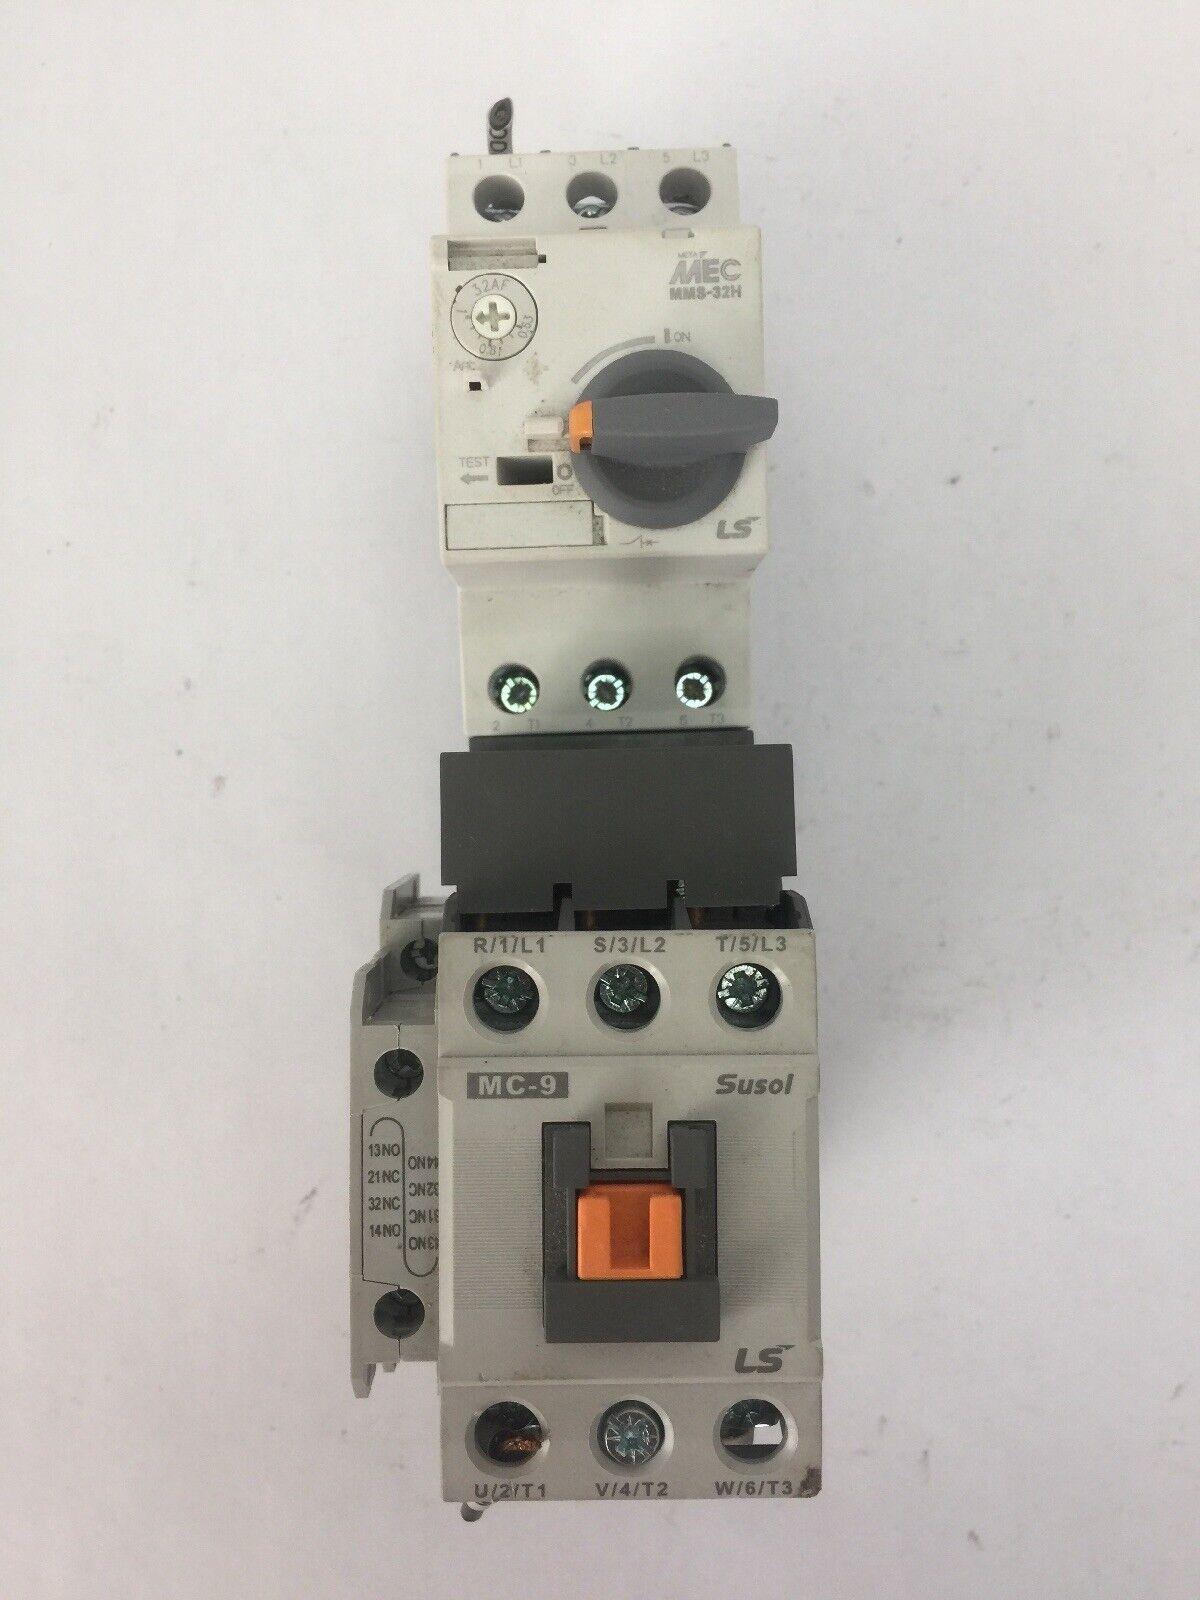 LS MOTOR STARTER MC-9 COIL 24VDC MMS-32H 0.63-1.0A MU-45 RAIL MOUNTING ADAPTOR